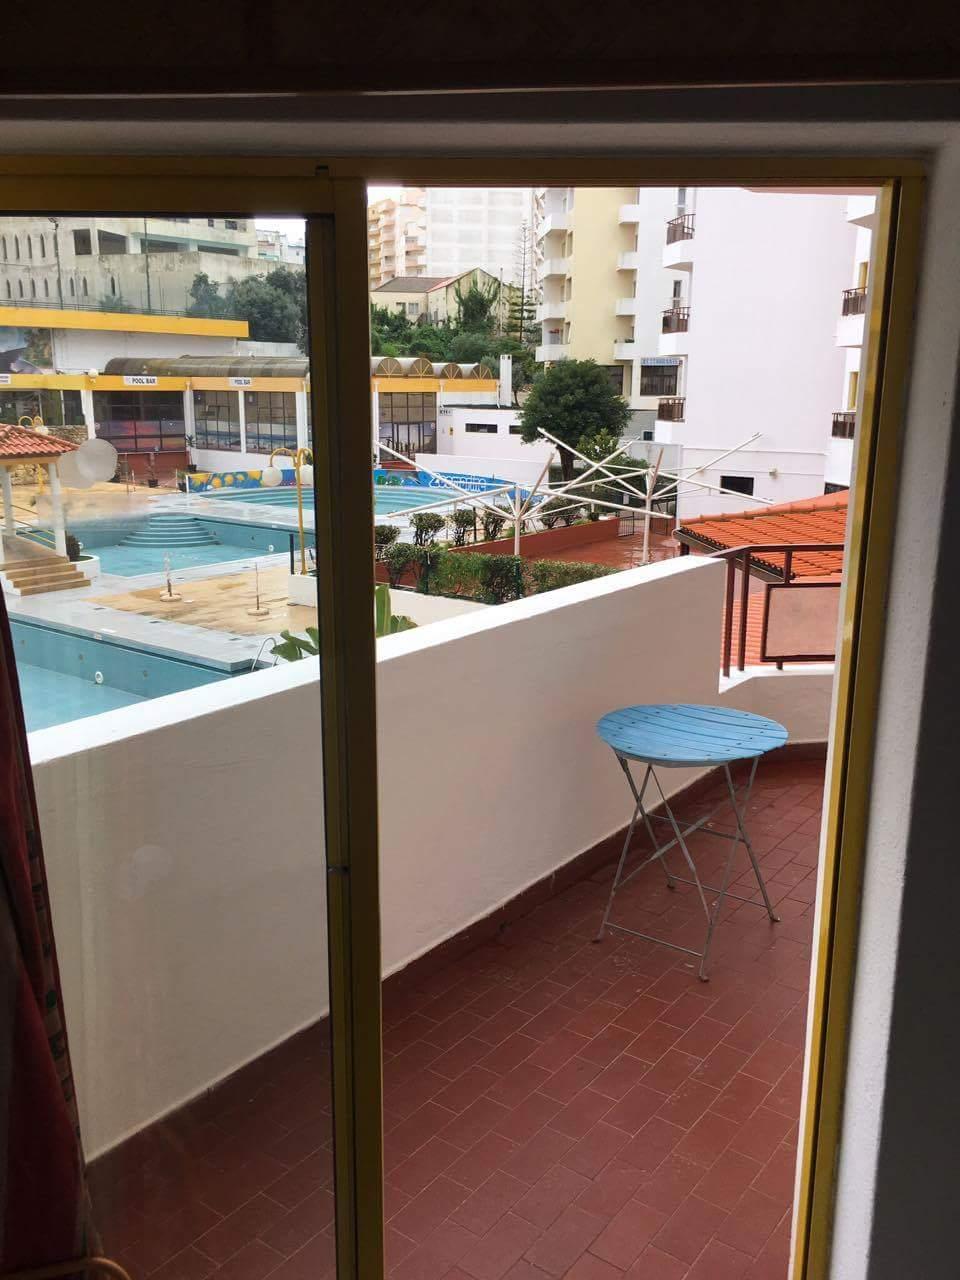 Location appartements et villas de vacance, Apartamento T1 Praia da Rocha à Portimão, Portugal Algarve, REF_IMG_4055_4062